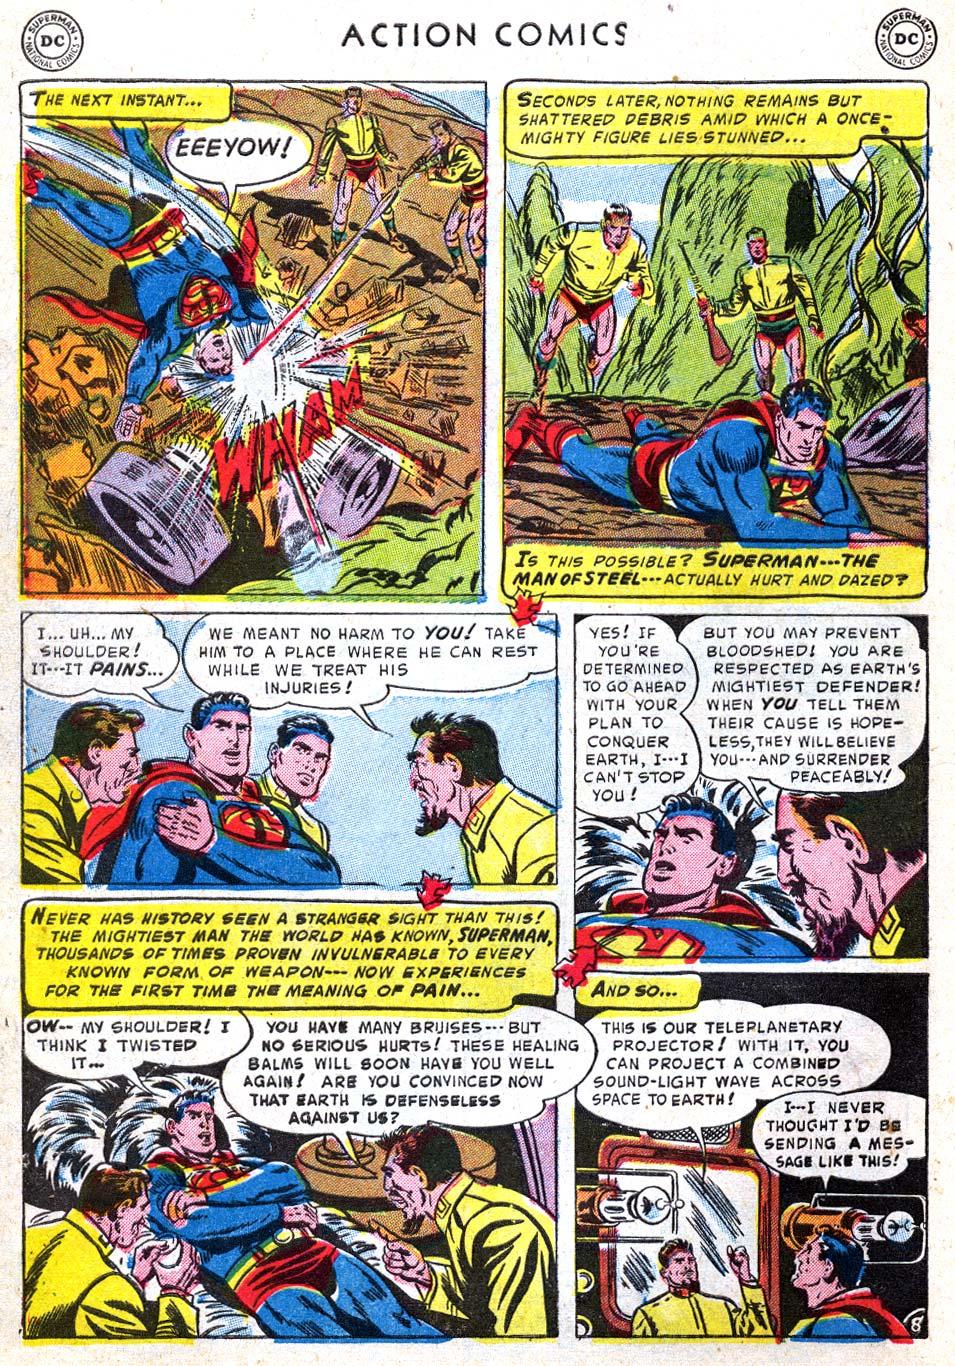 Action Comics (1938) 182 Page 9